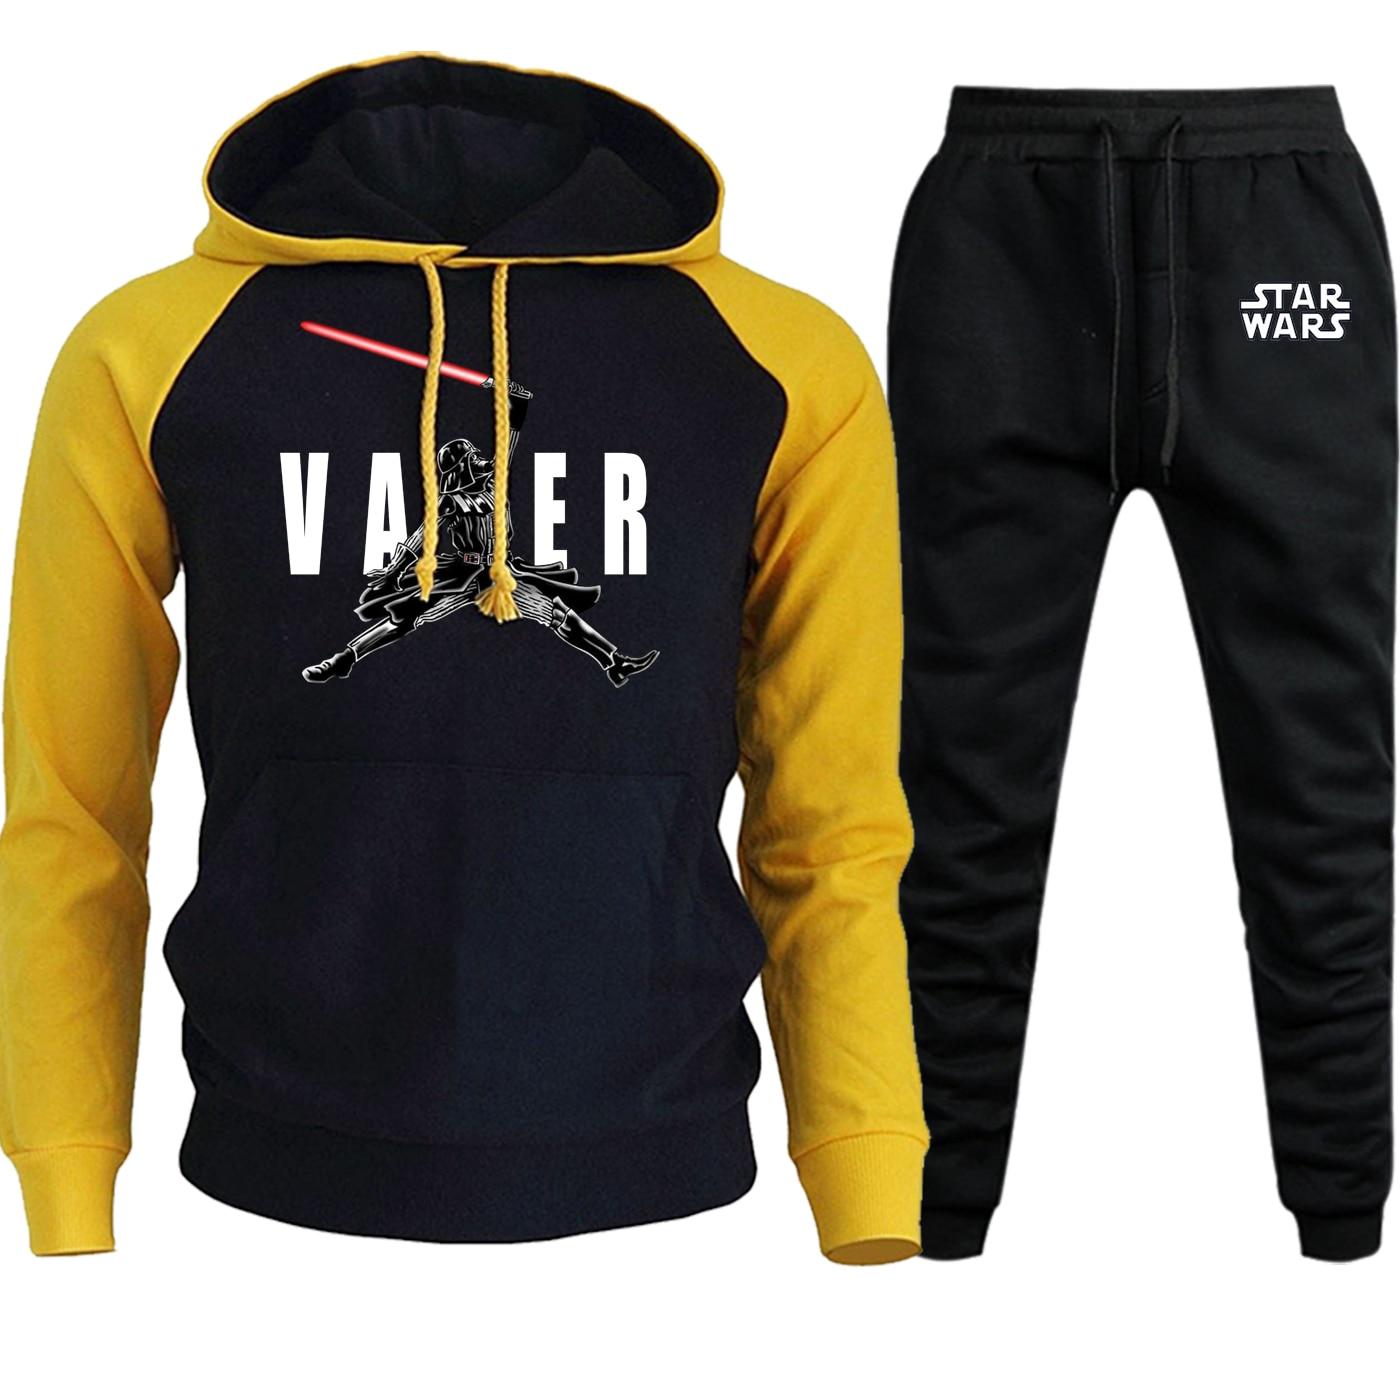 Darth Vader Star Wars Autumn Winter 2019 New Streetwear Mens Hoodies Raglan Hip Hop Suit Male Fleece Hooded+Pants 2 Piece Set